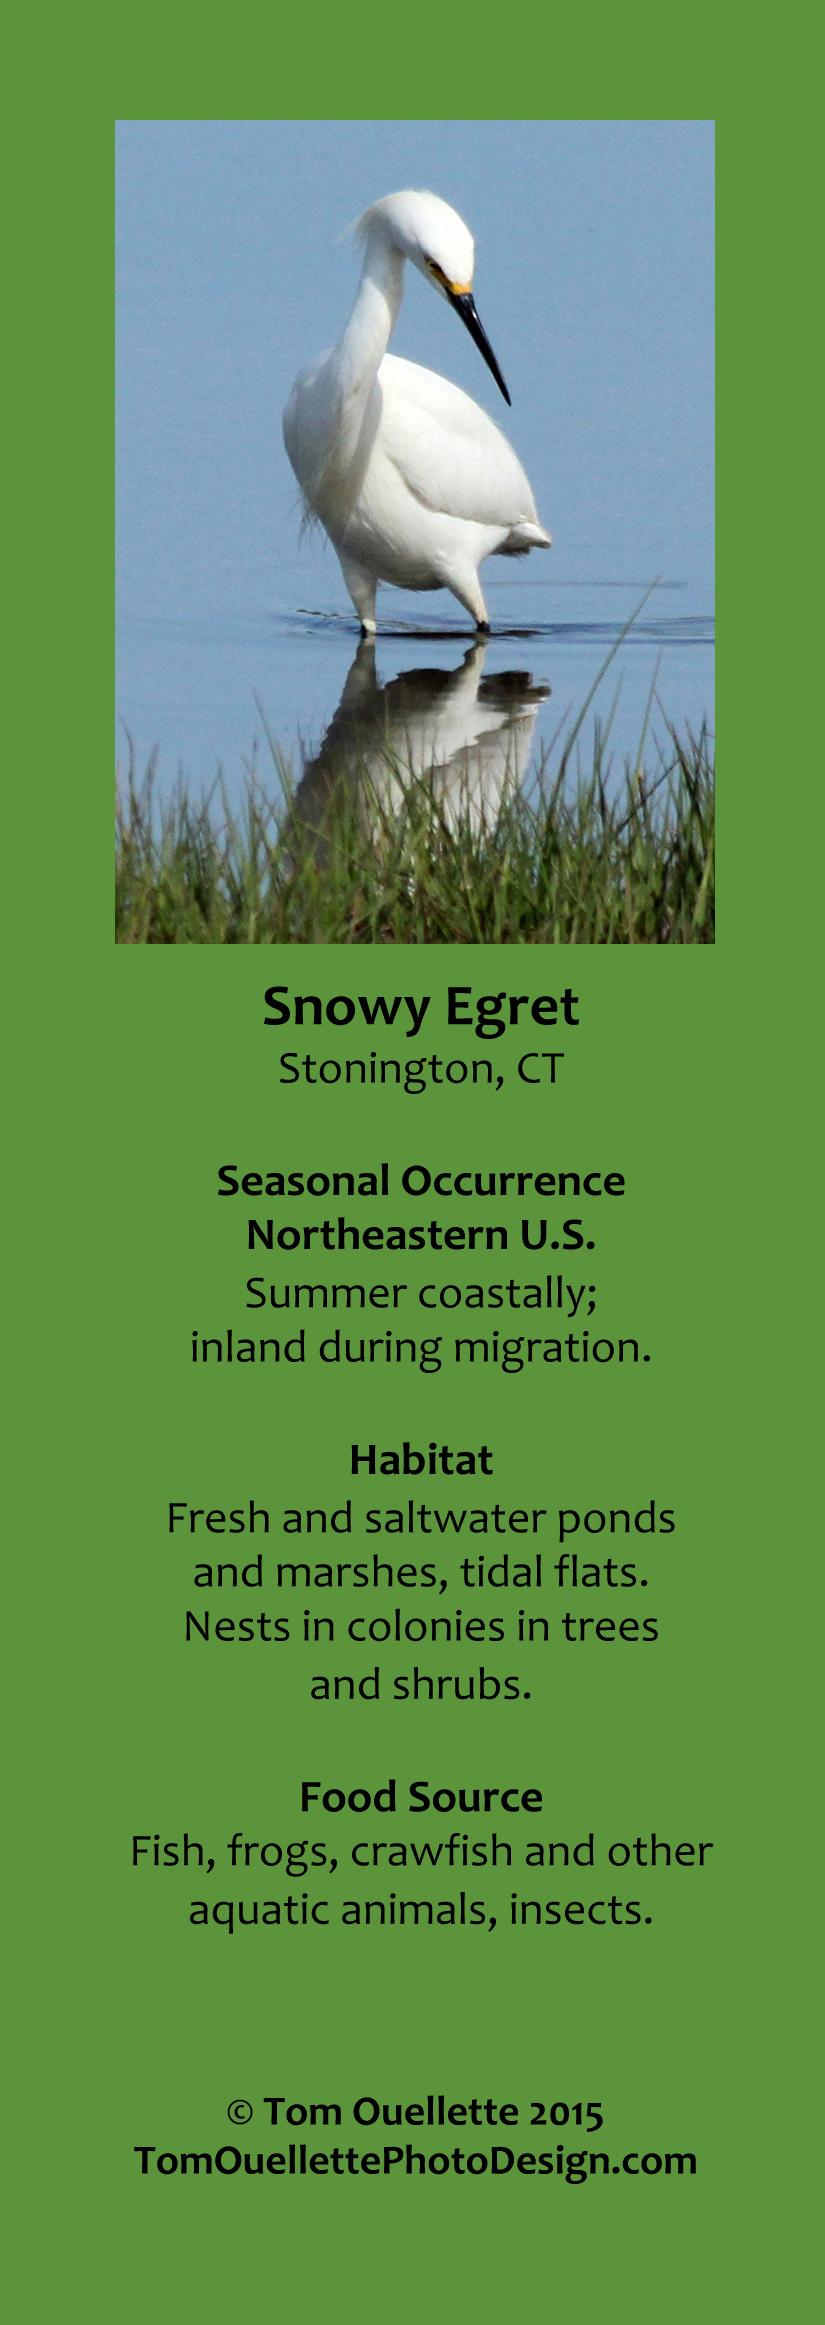 9 SS A10 Snowy Egret.jpg